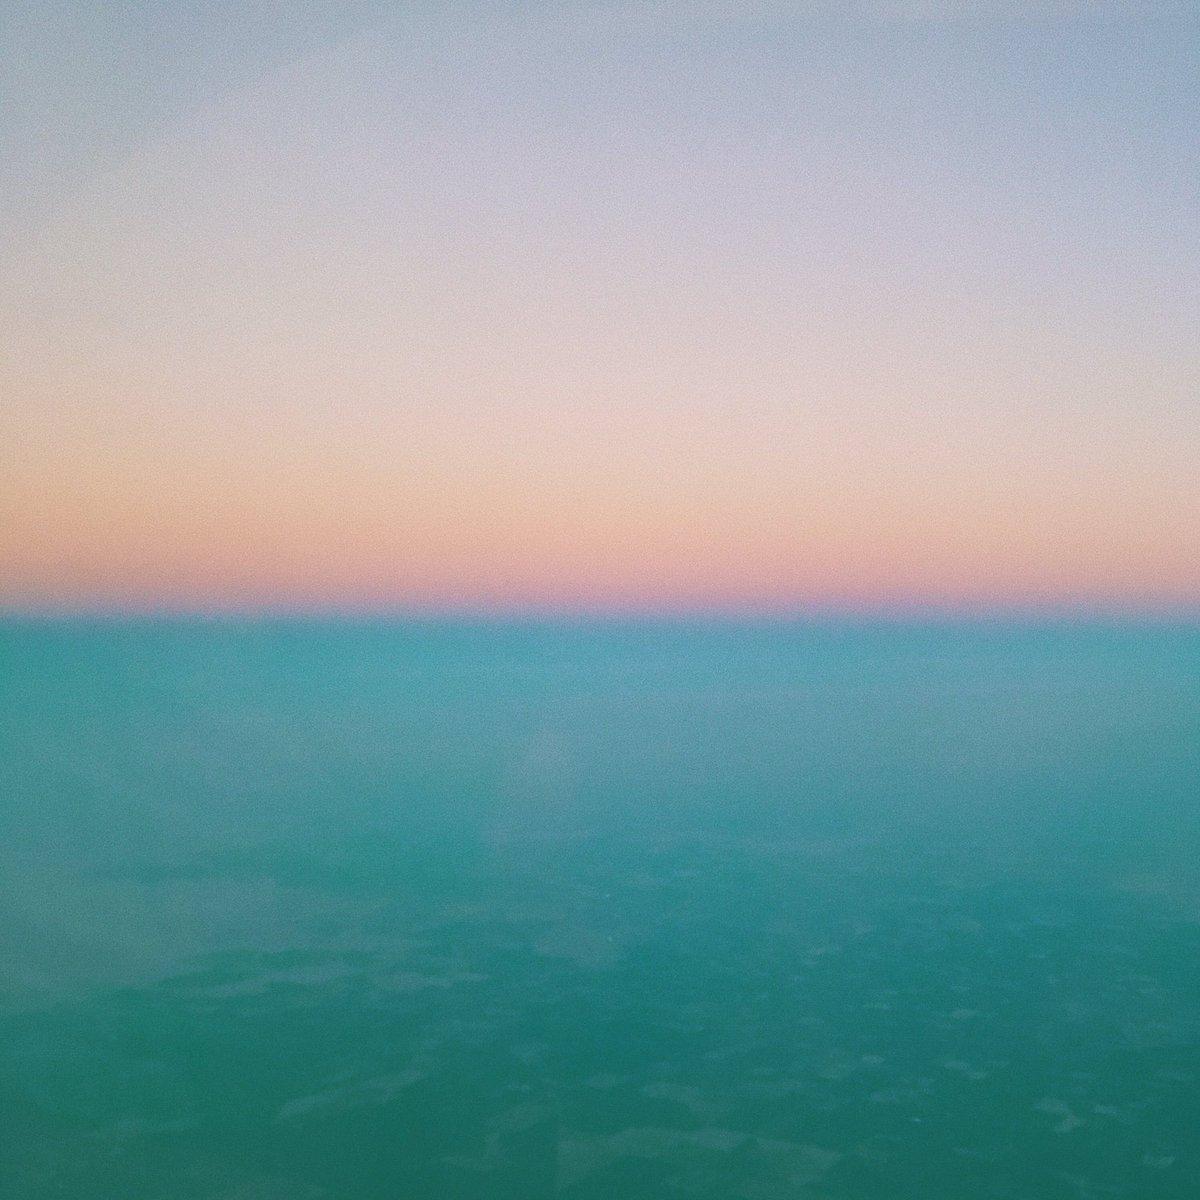 Horizon meditation https://t.co/fYk7ZtJ86l